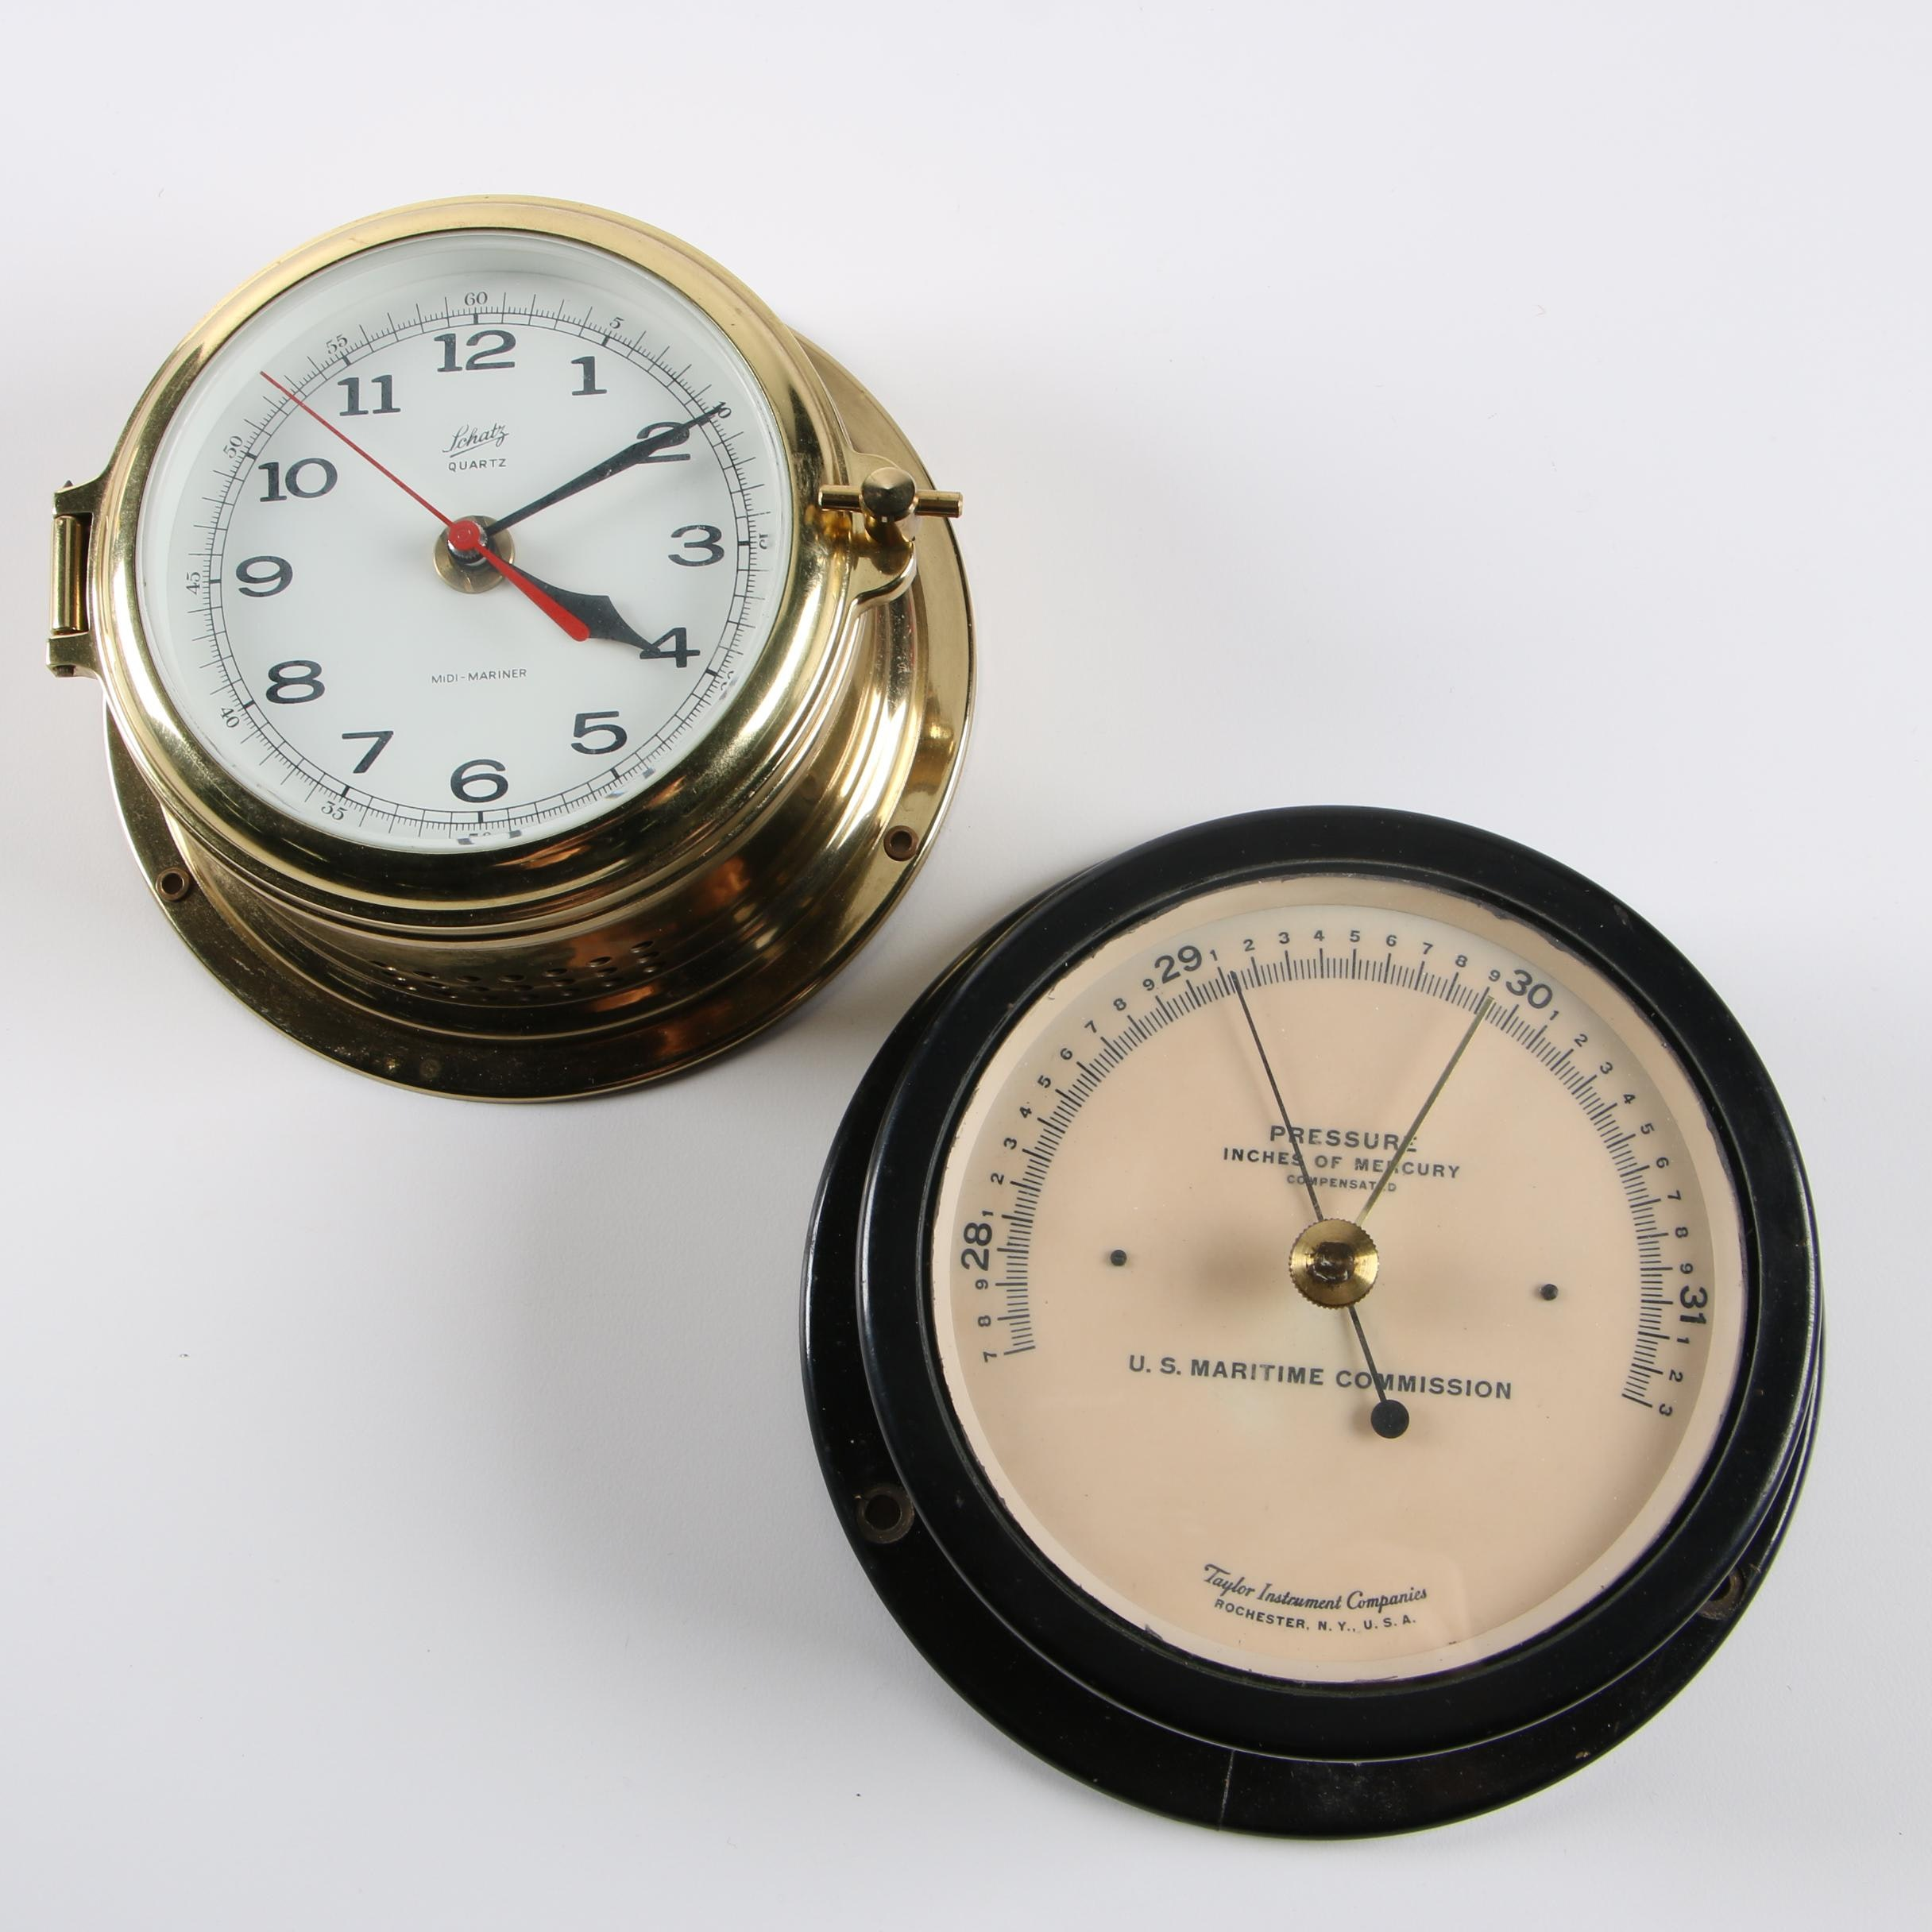 Schatz Quartz Midi-Mariner Ship's Clock and Vintage Maritime Barometer